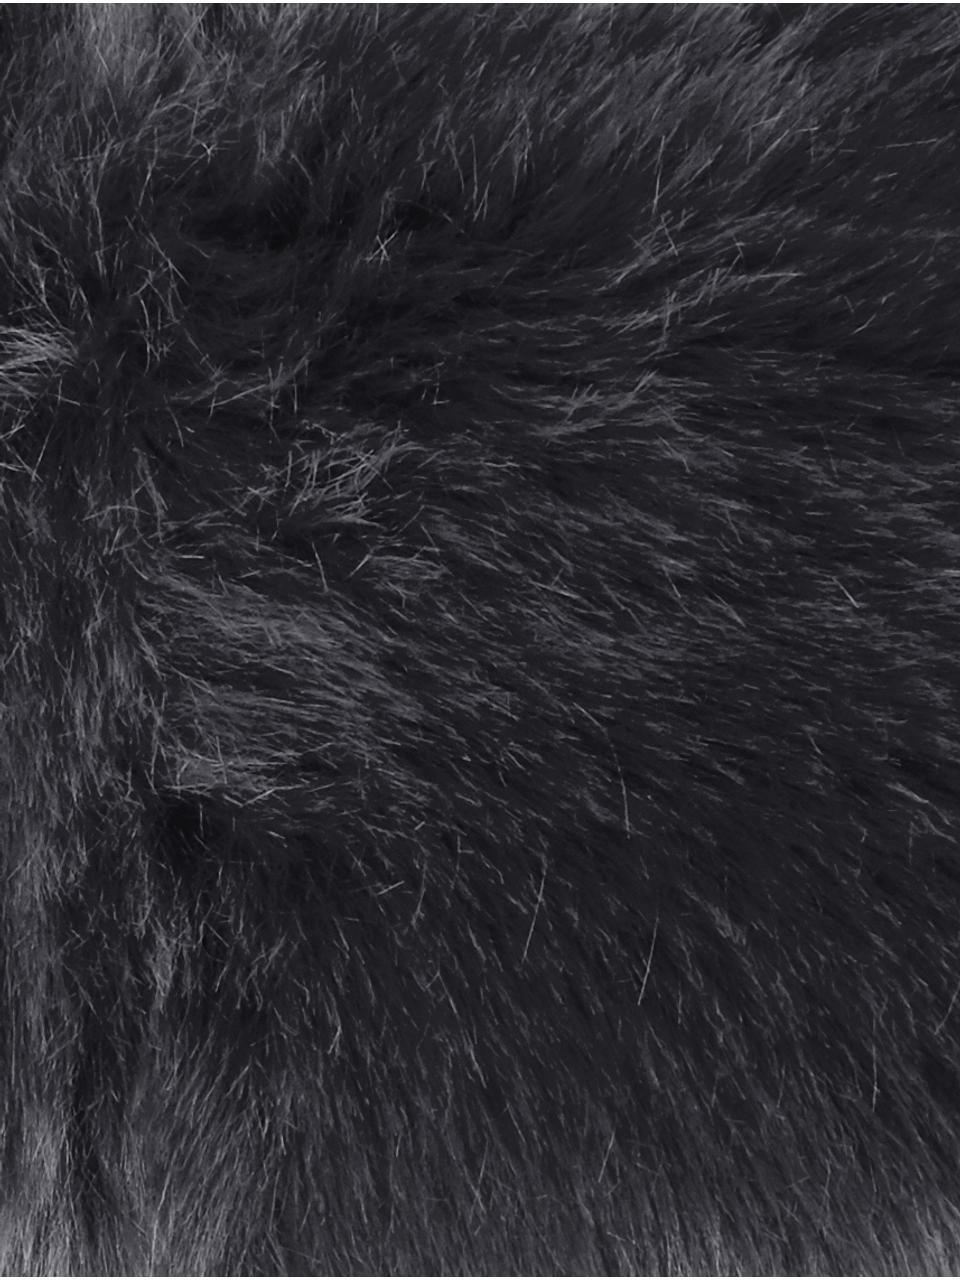 Flauschige Kunstfell-Kissenhülle Mathilde in Dunkelgrau, glatt, Vorderseite: 67% Acryl, 33% Polyester, Rückseite: 100% Polyester, Dunkelgrau, 40 x 40 cm